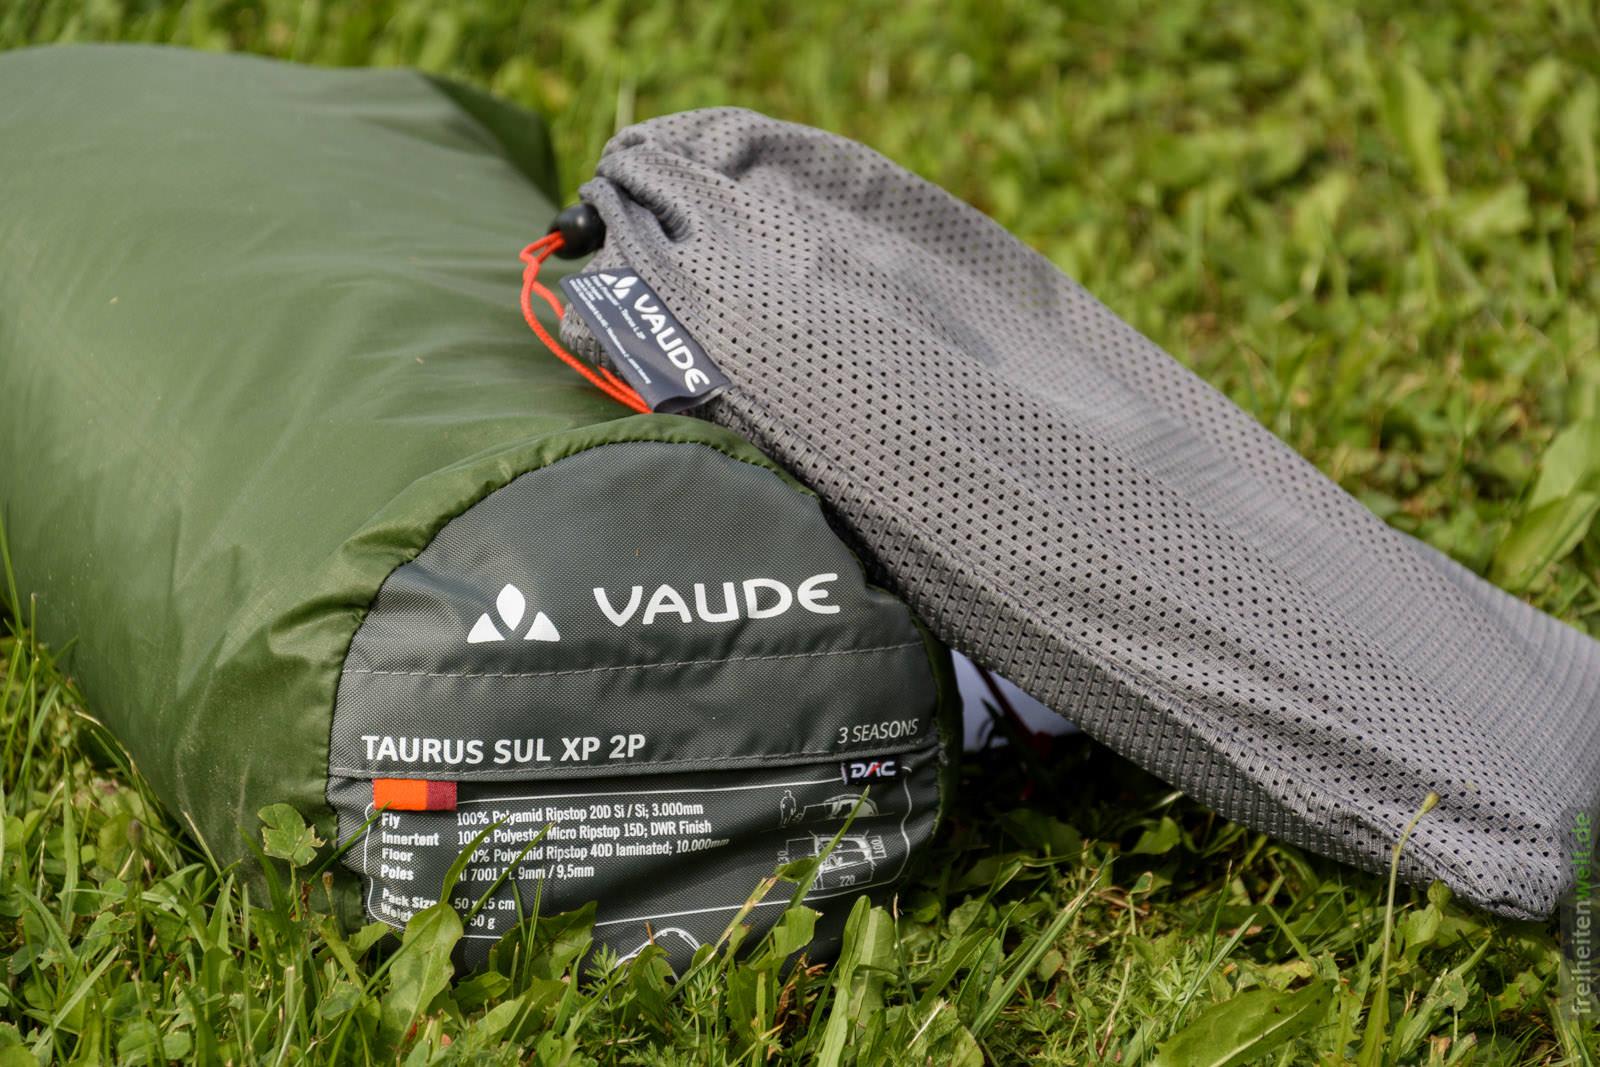 Vaude Taurus SUL XP 2P Packsack